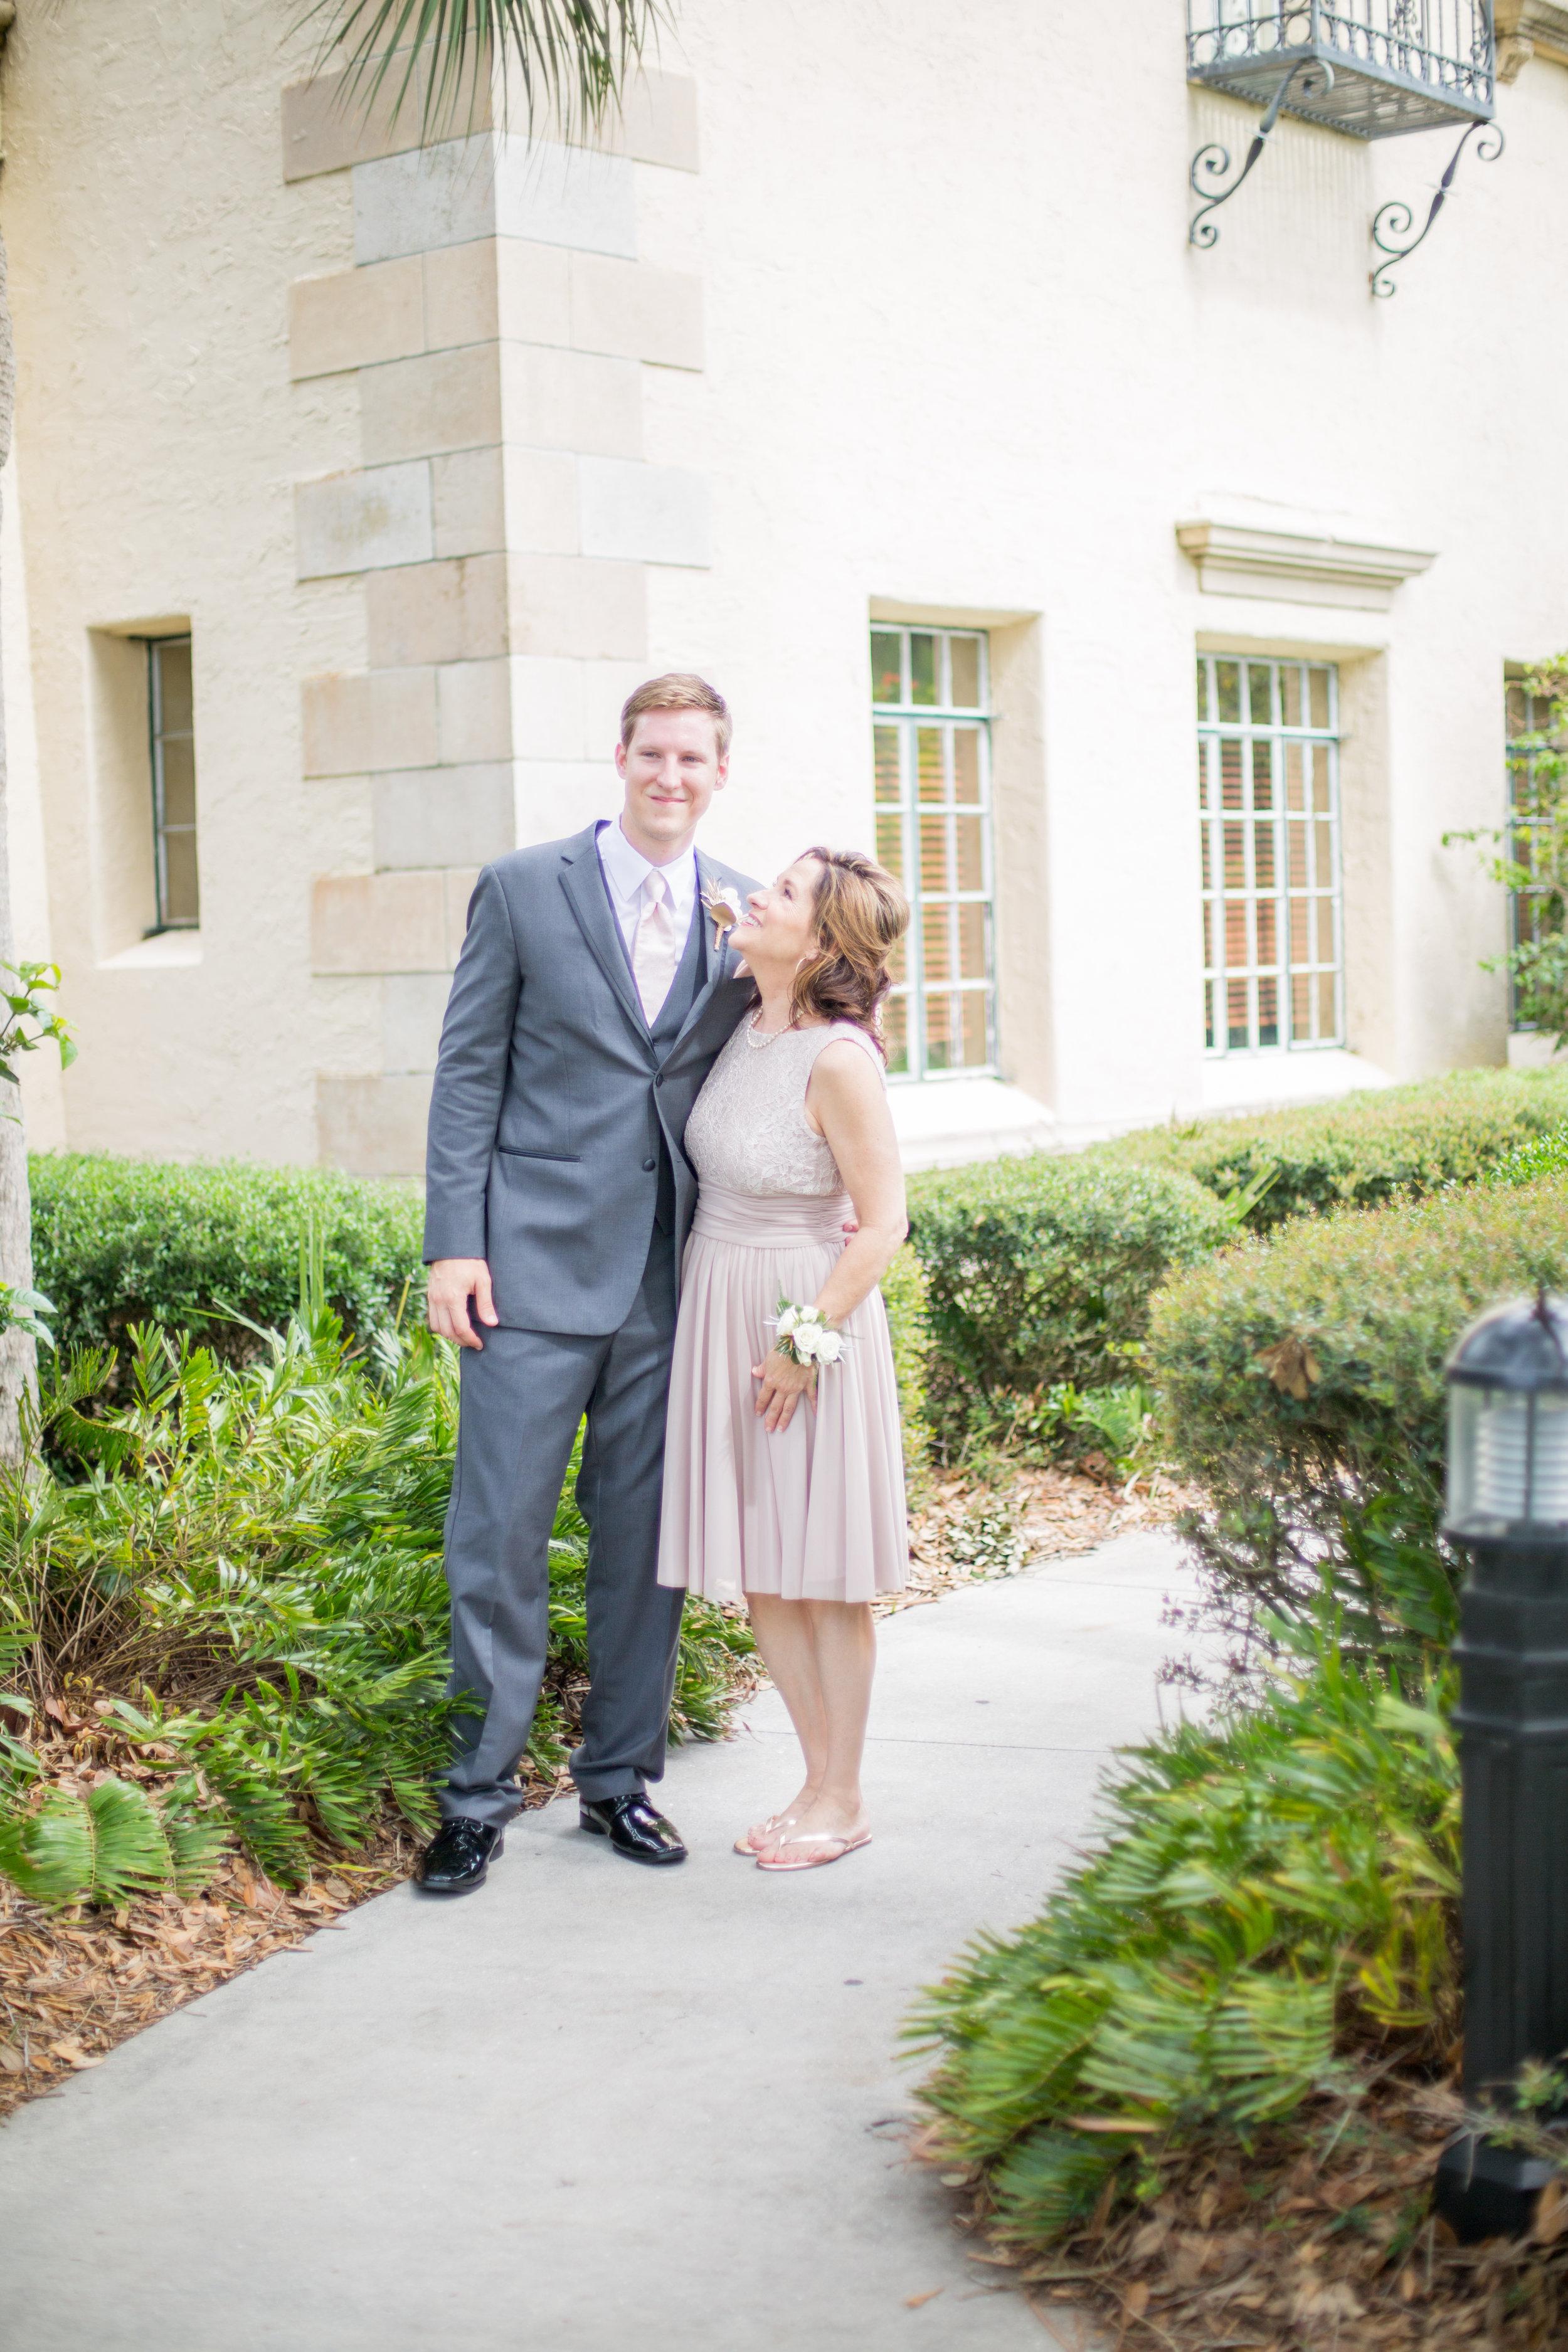 Powel Crosley Estate   Wedding   Pink and Gold Wedding   Wedding Portraits  Groom Portraits  Sarasota Weddings   Spring Wedding   Jess Anne Photography